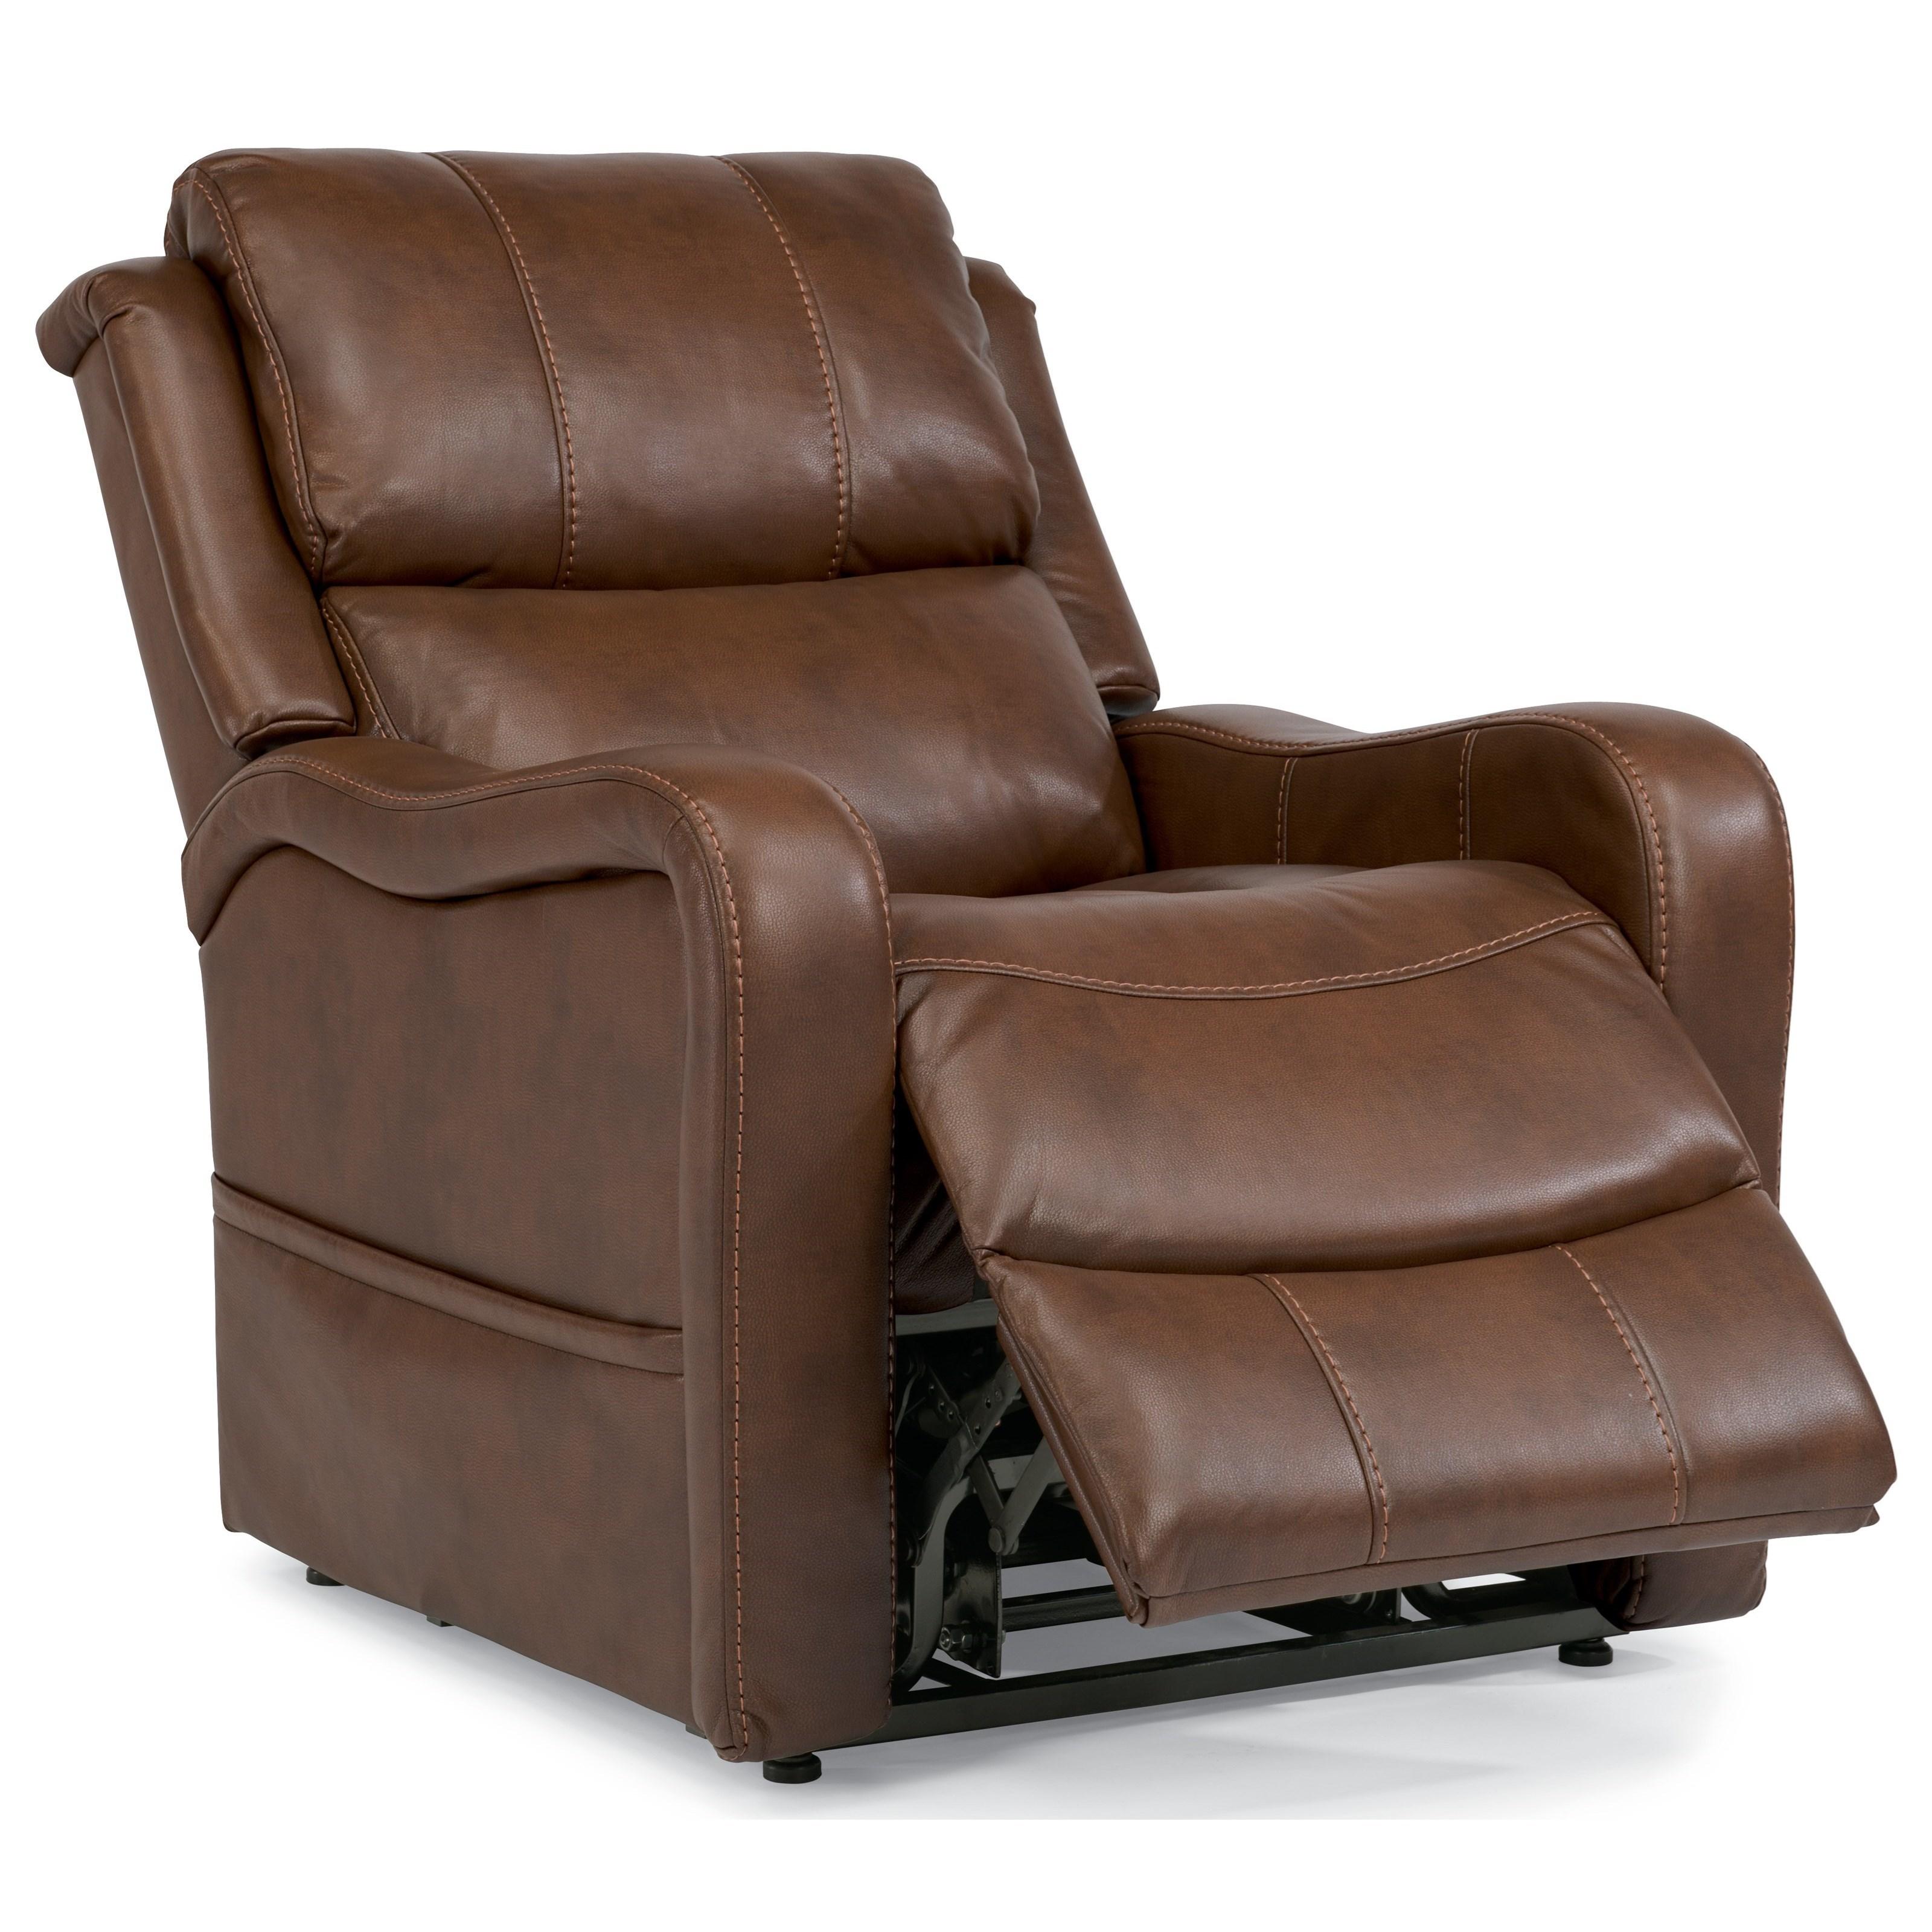 Flexsteel Latitudes Lift Chairs Bailey ThreeWay Power